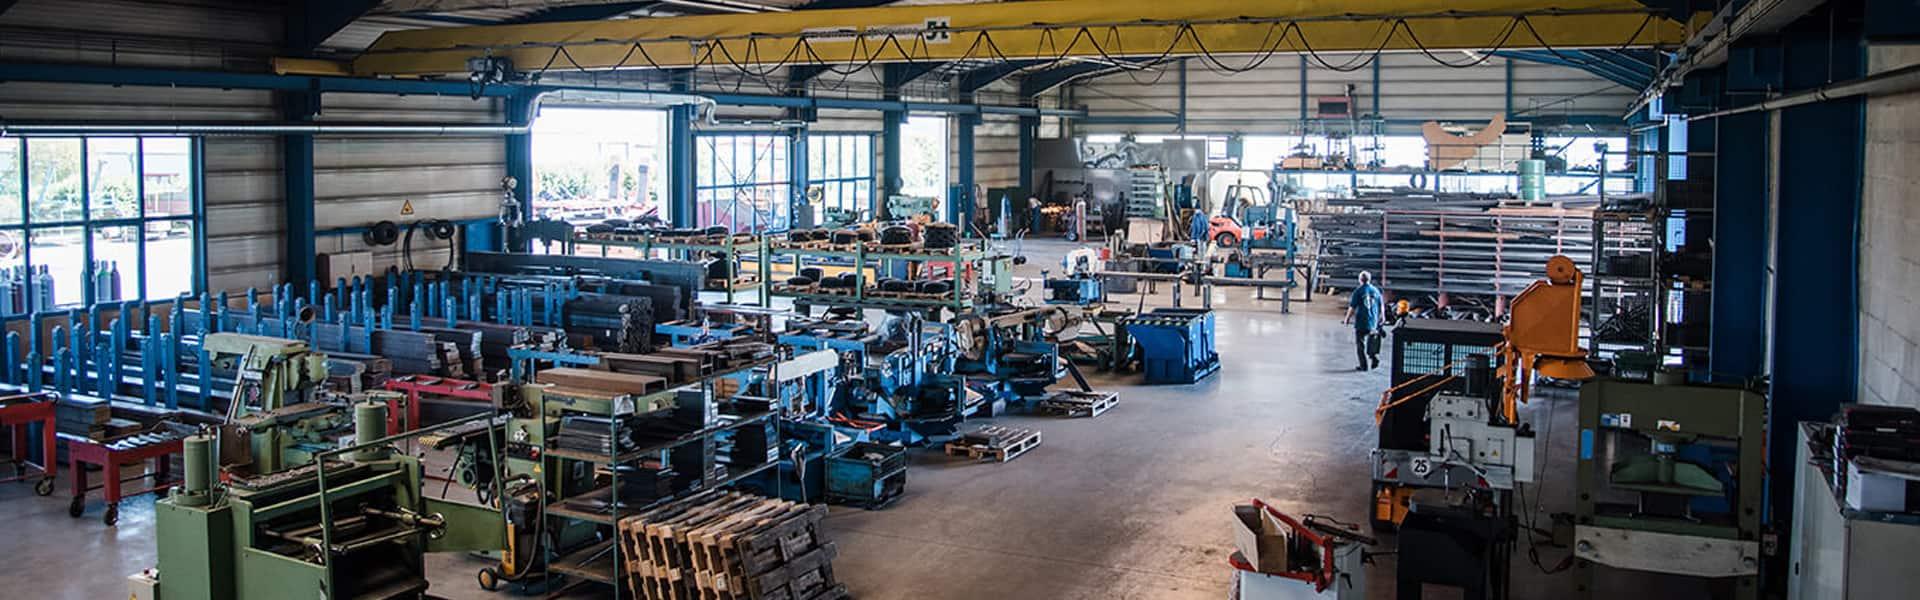 Lederer Maschinenbau-Landtechnik GmbH - Bild